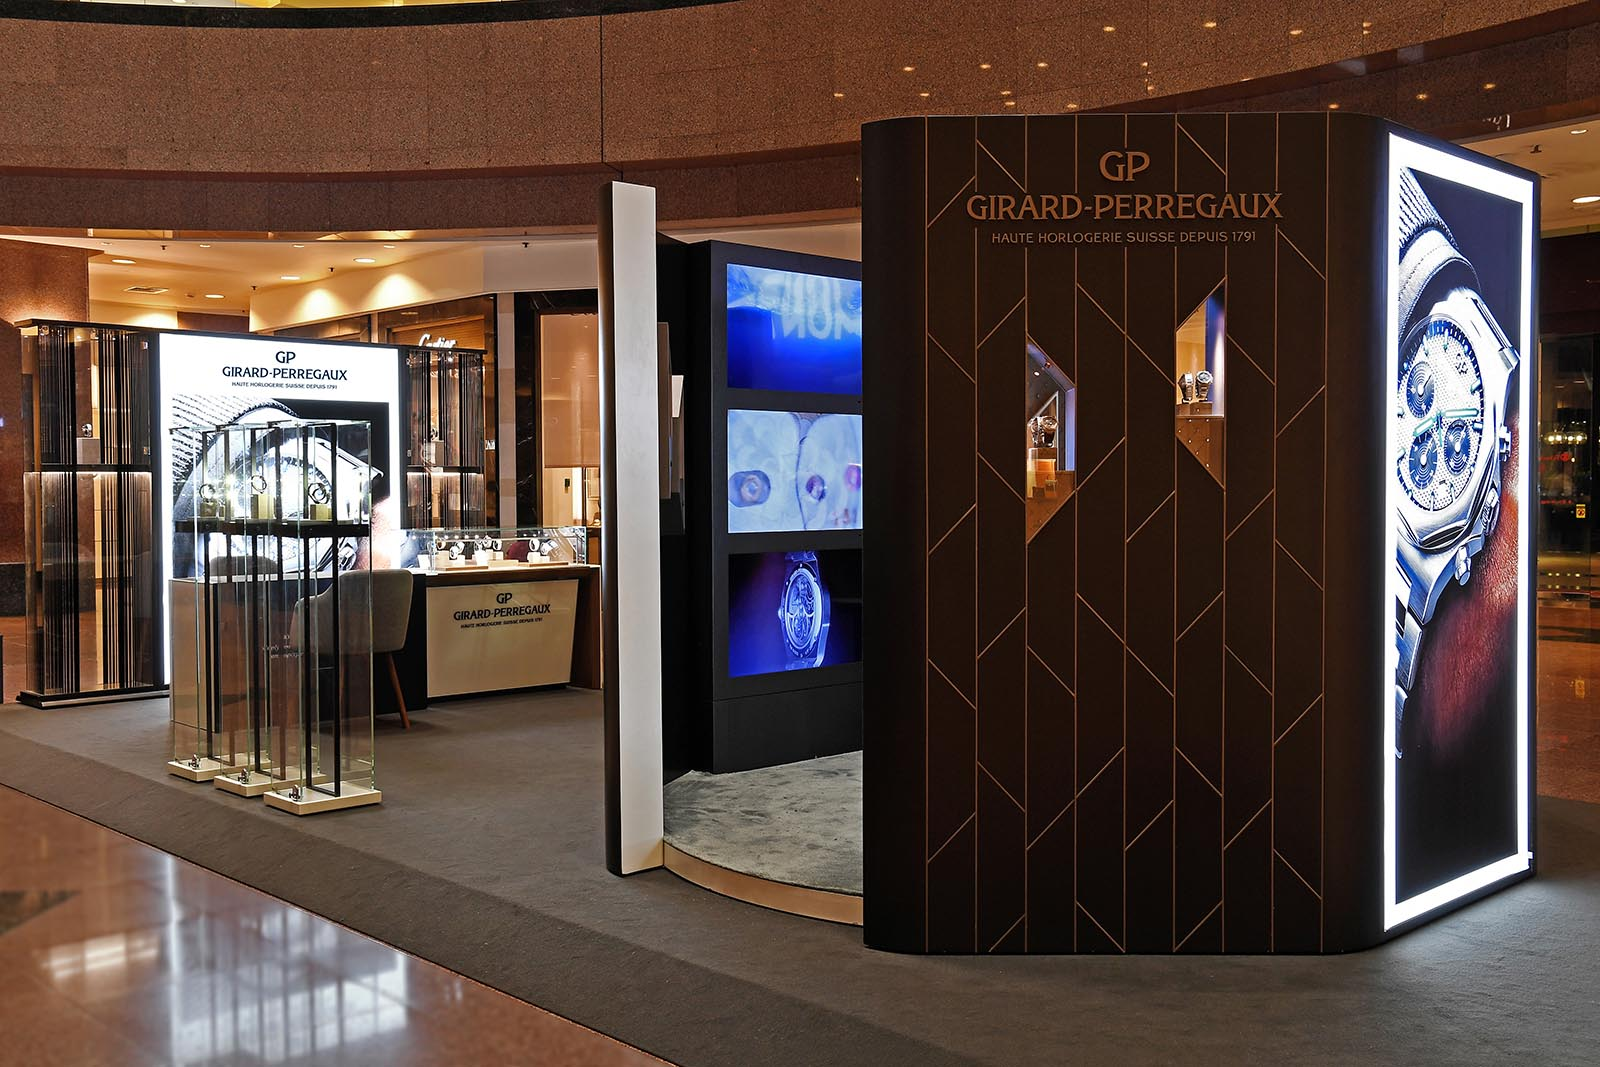 Girard-Perregaux Laureato Chronograph Exhibition 2